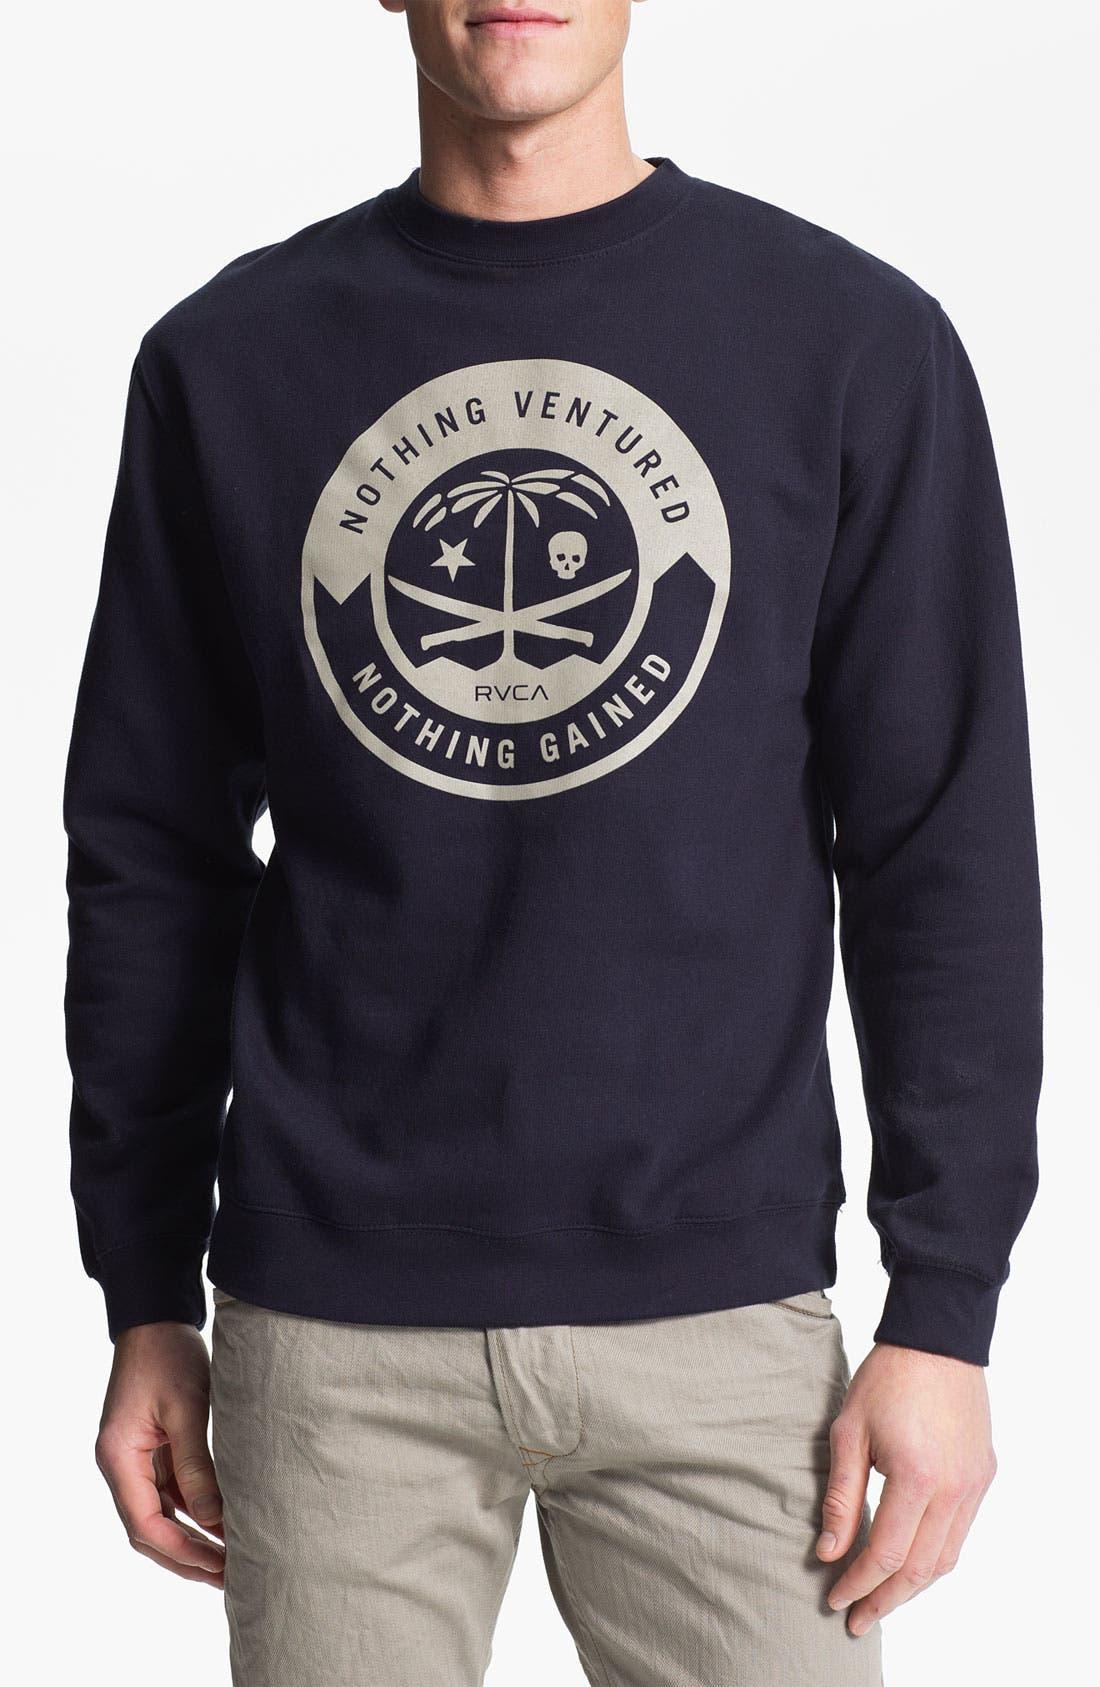 Main Image - RVCA 'Korps' Graphic Crewneck Sweatshirt